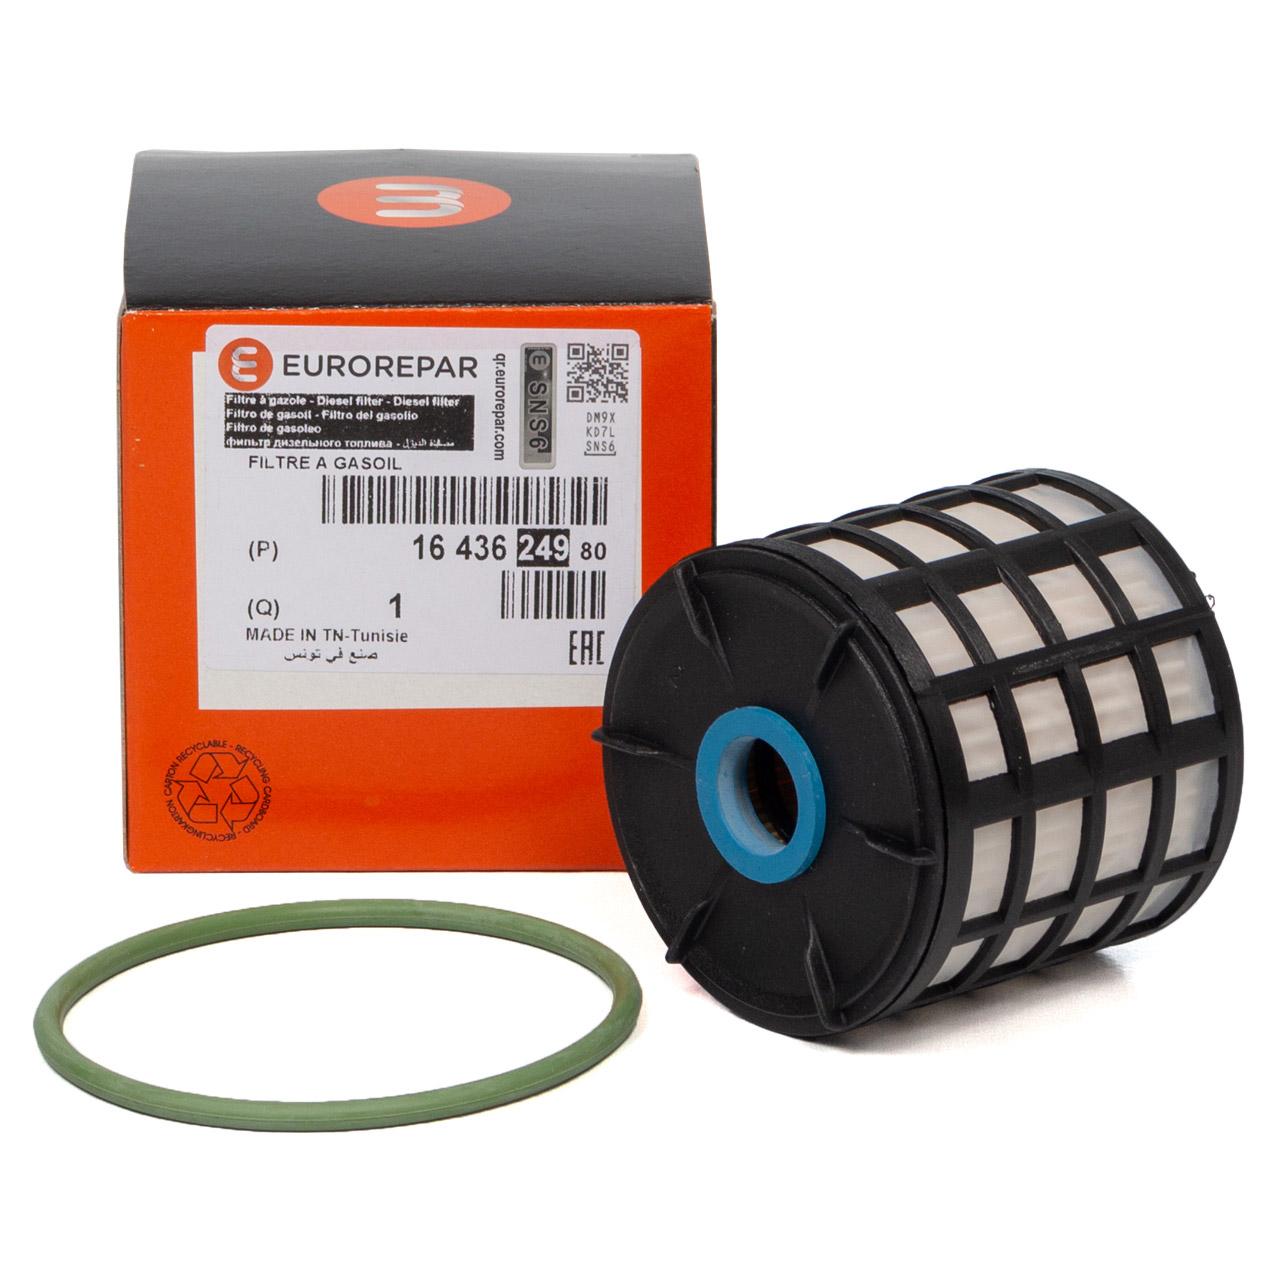 ORIGINAL PSA EUROREPAR Kraftstofffilter Dieselfilter 1.6/2.0 HDi 1643624980